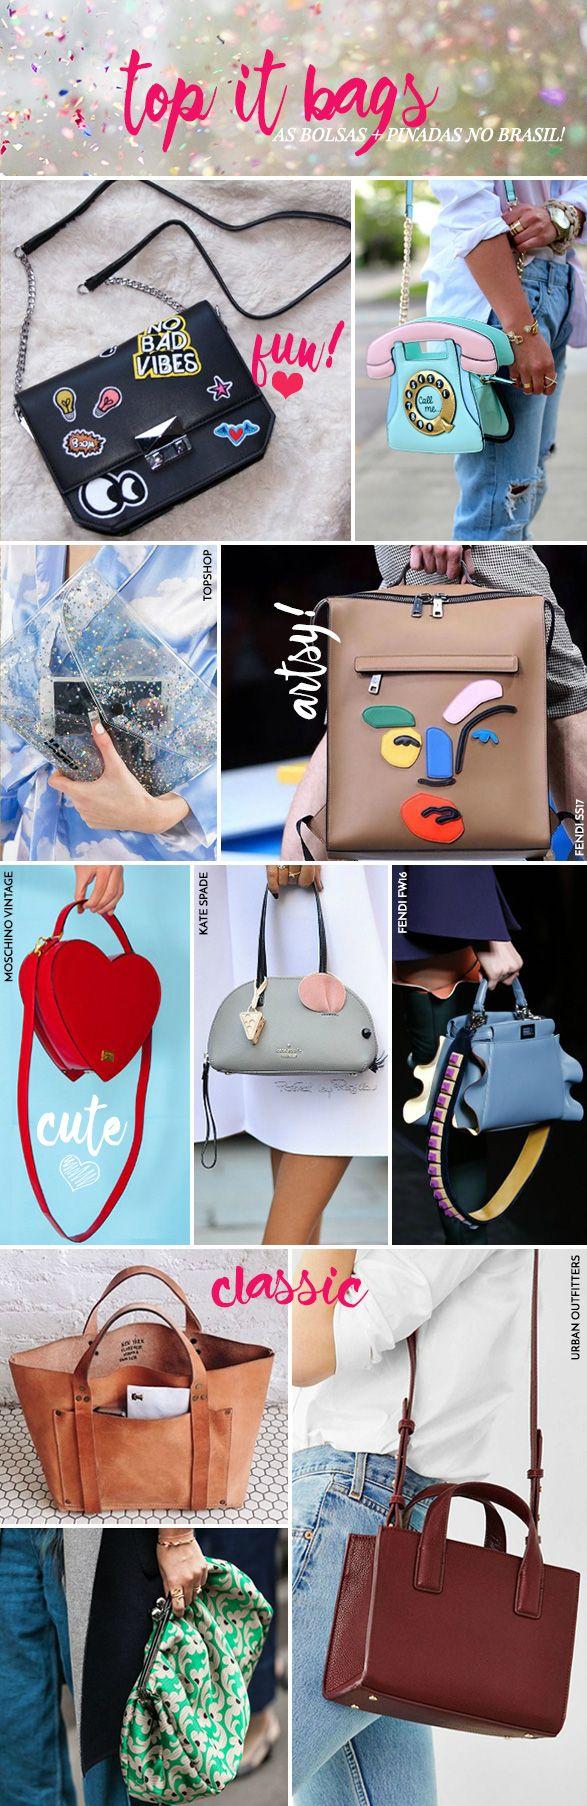 Top it bags: as bolsas mais pinadas no Brasil! - Garotas Estúpidas - Garotas Estúpidas